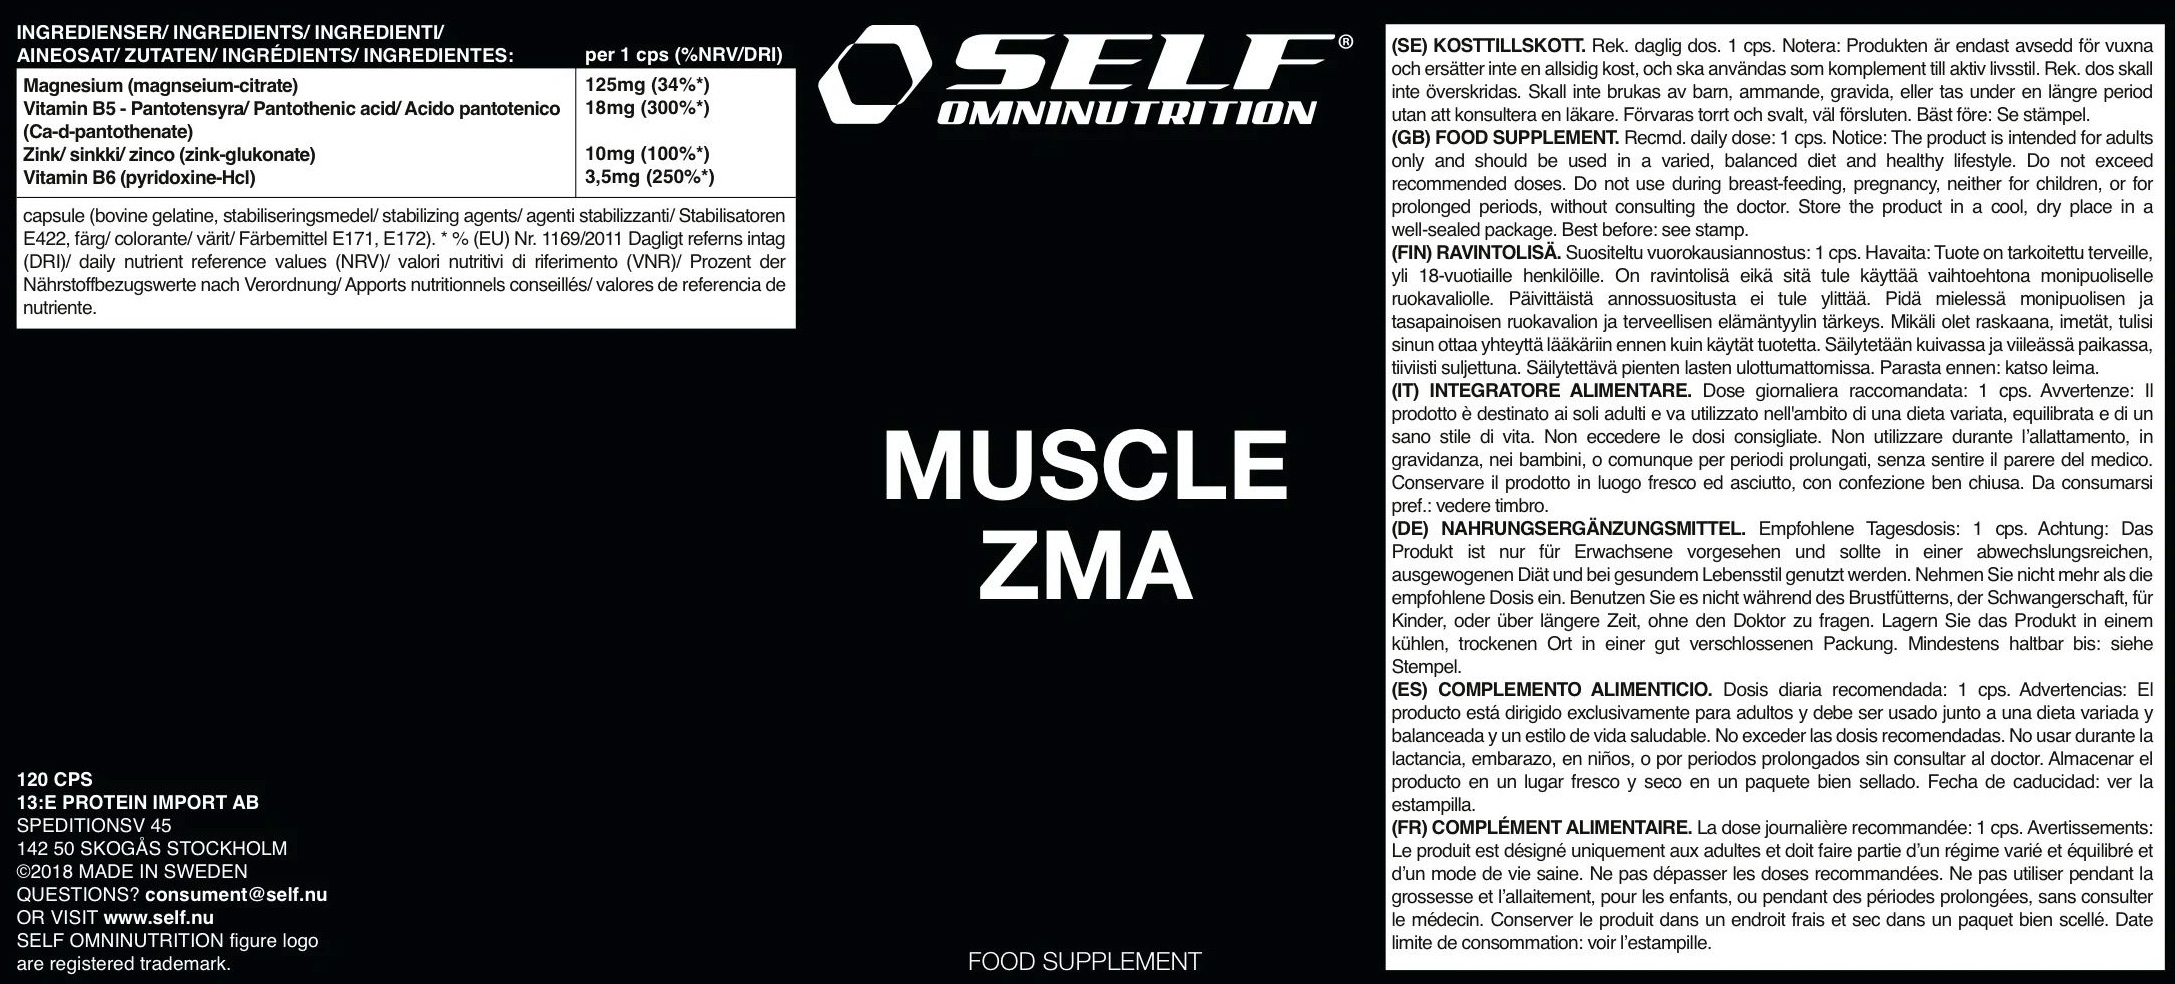 self-muscle-zma-info